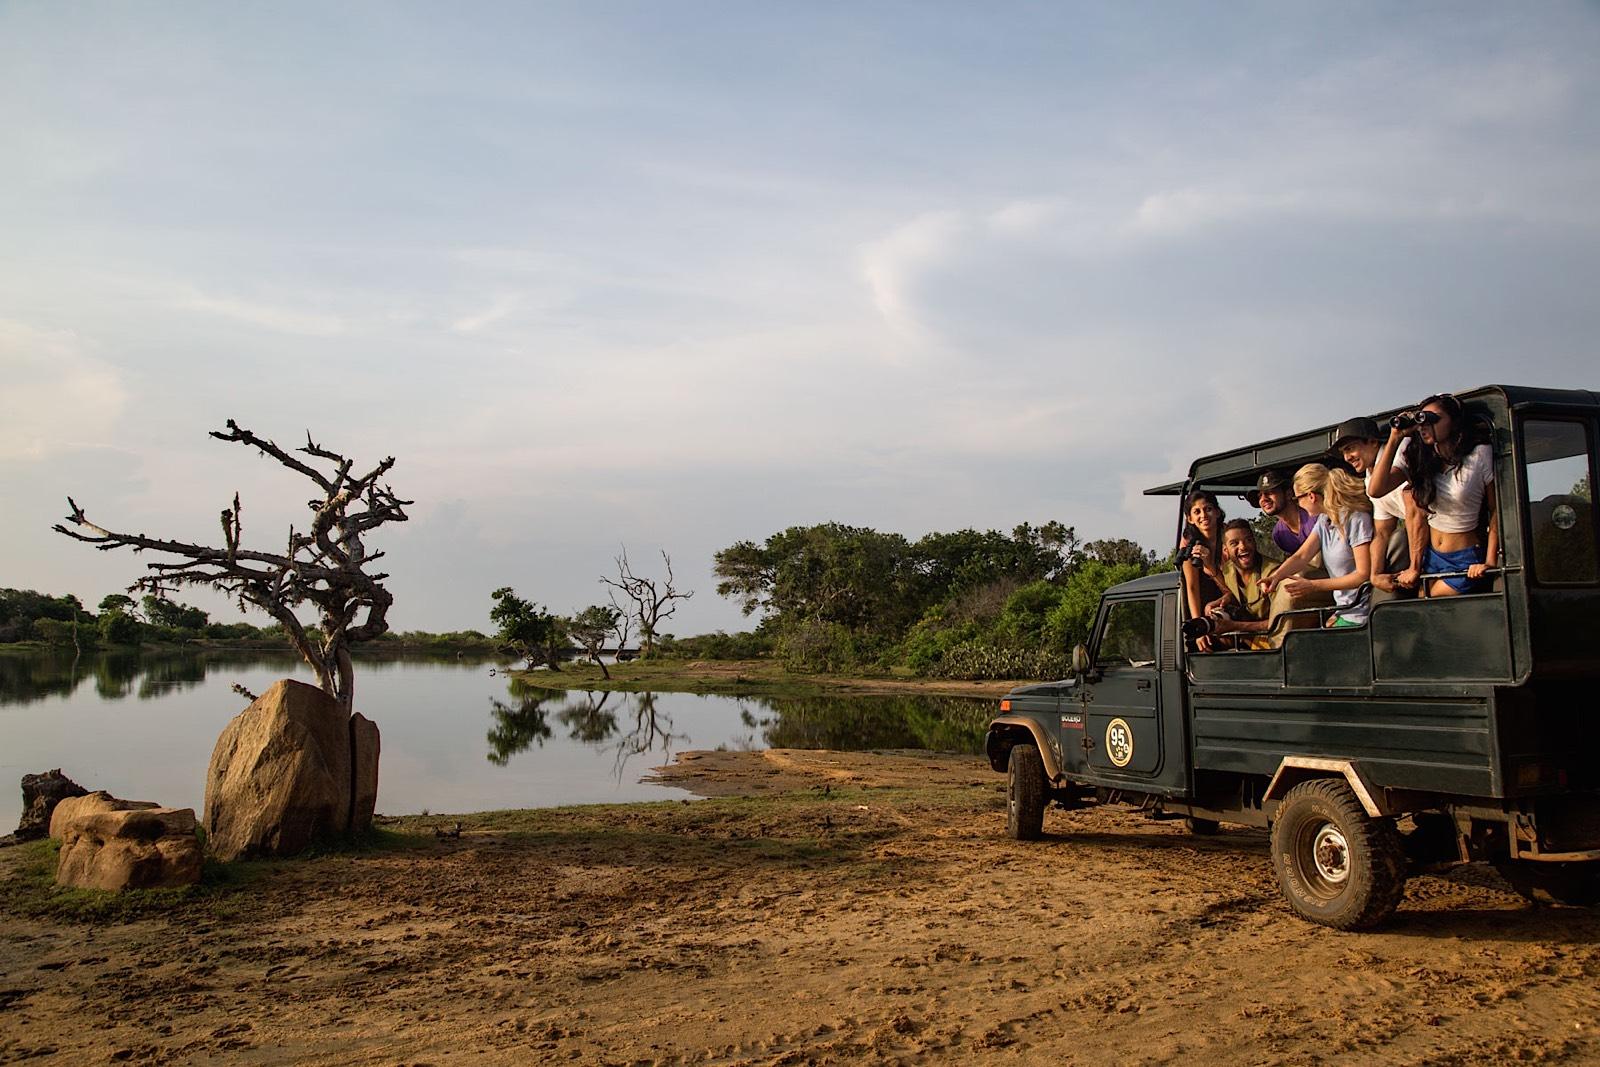 invite-to-paradise-holiday-honeymoon-sri-lanka-specialists-safari-lodge-cinnamon-wild-hotel-9.jpg